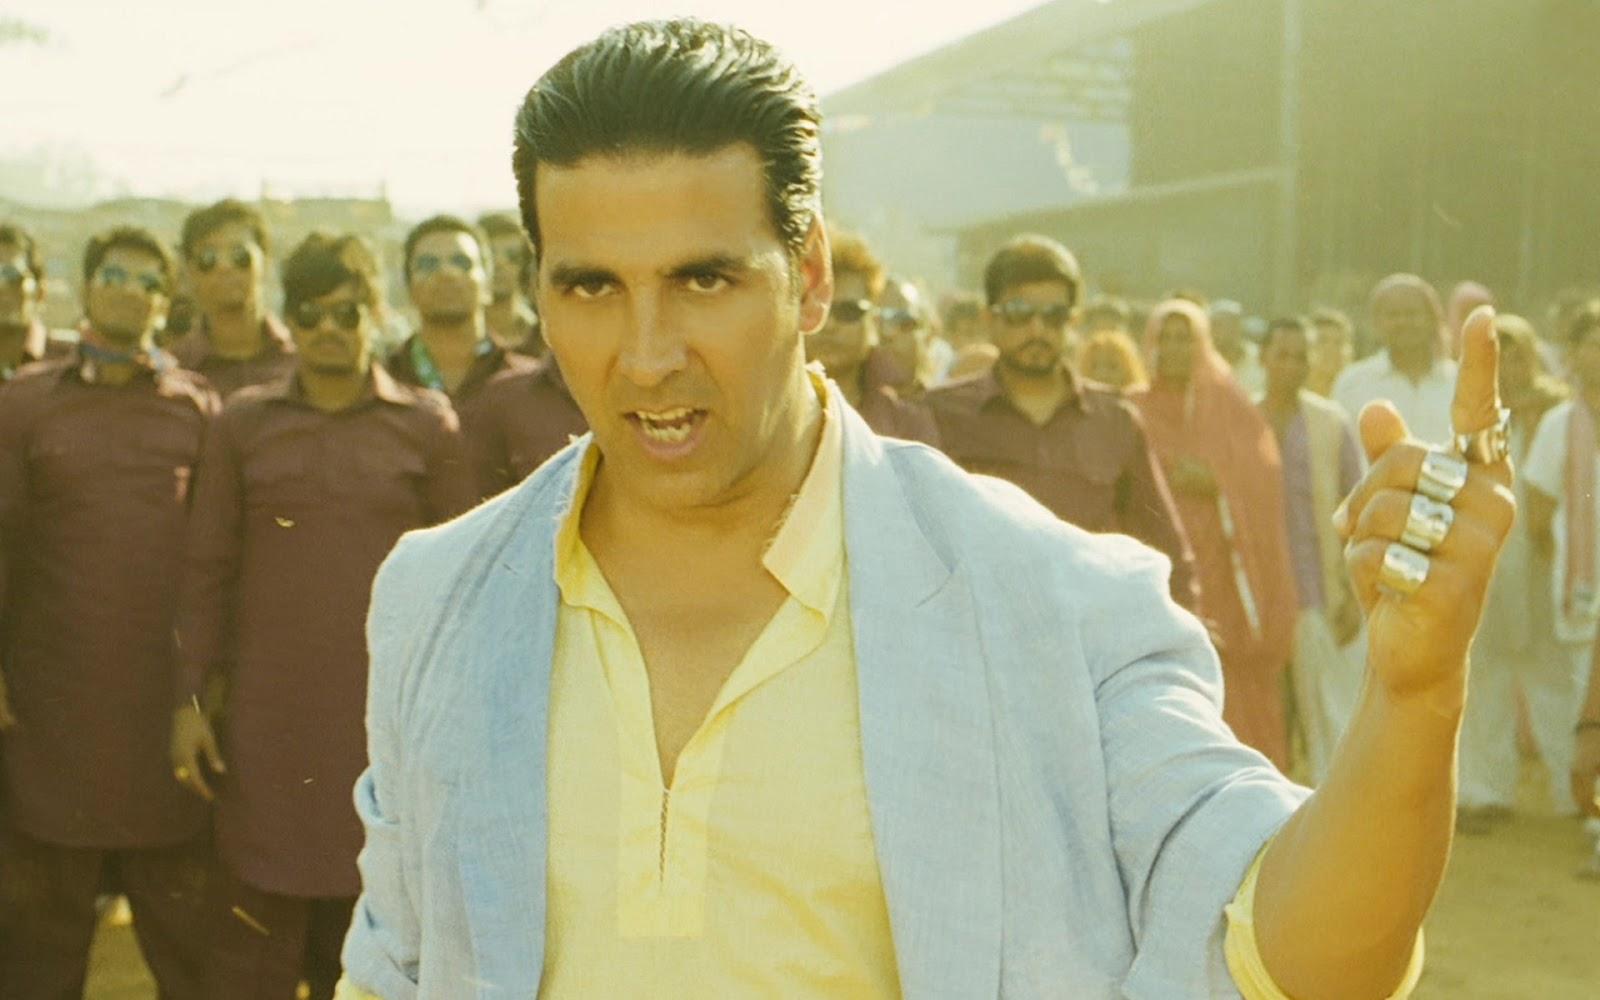 Boss Hindi Movie 2013 Hd Desktop Wallpapers And Movie -4815